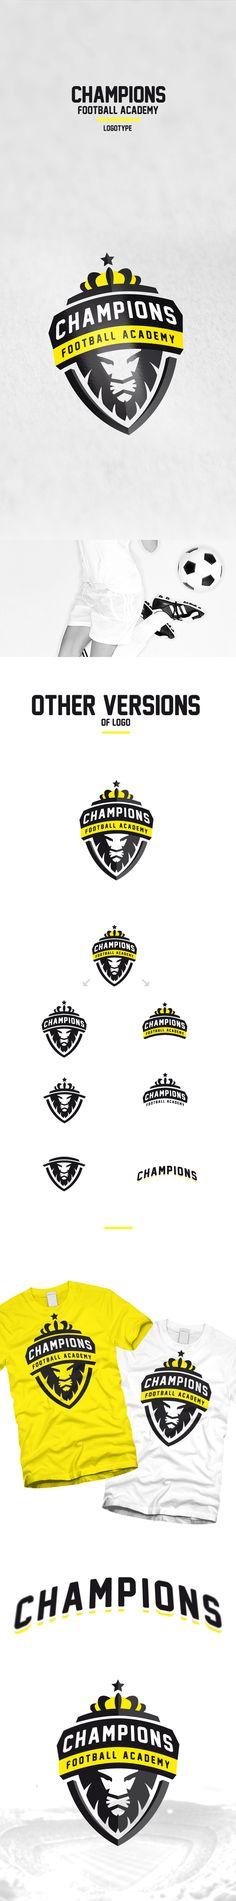 https://www.behance.net/gallery/25357427/Champions-Football-Academy